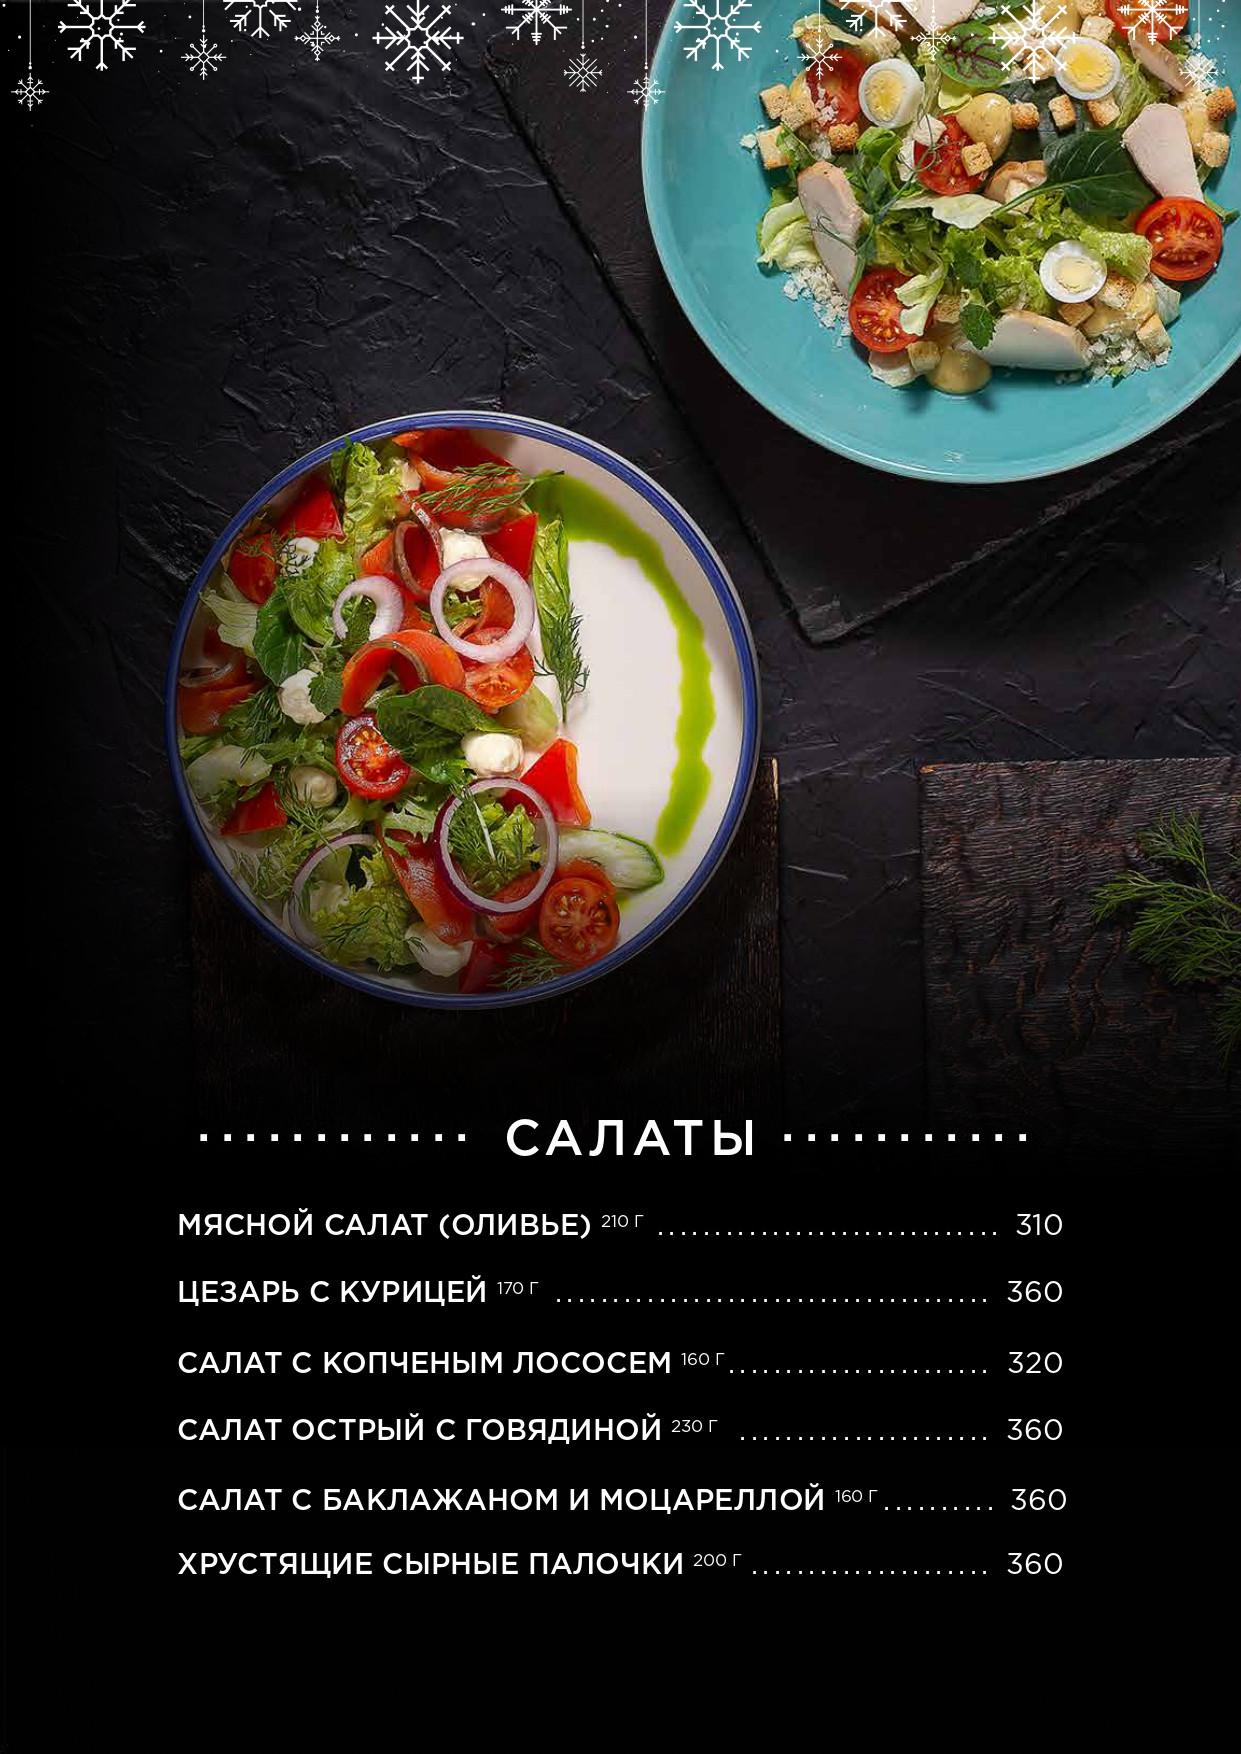 gastroli_menu_ny_2021_1превью_page-0003.